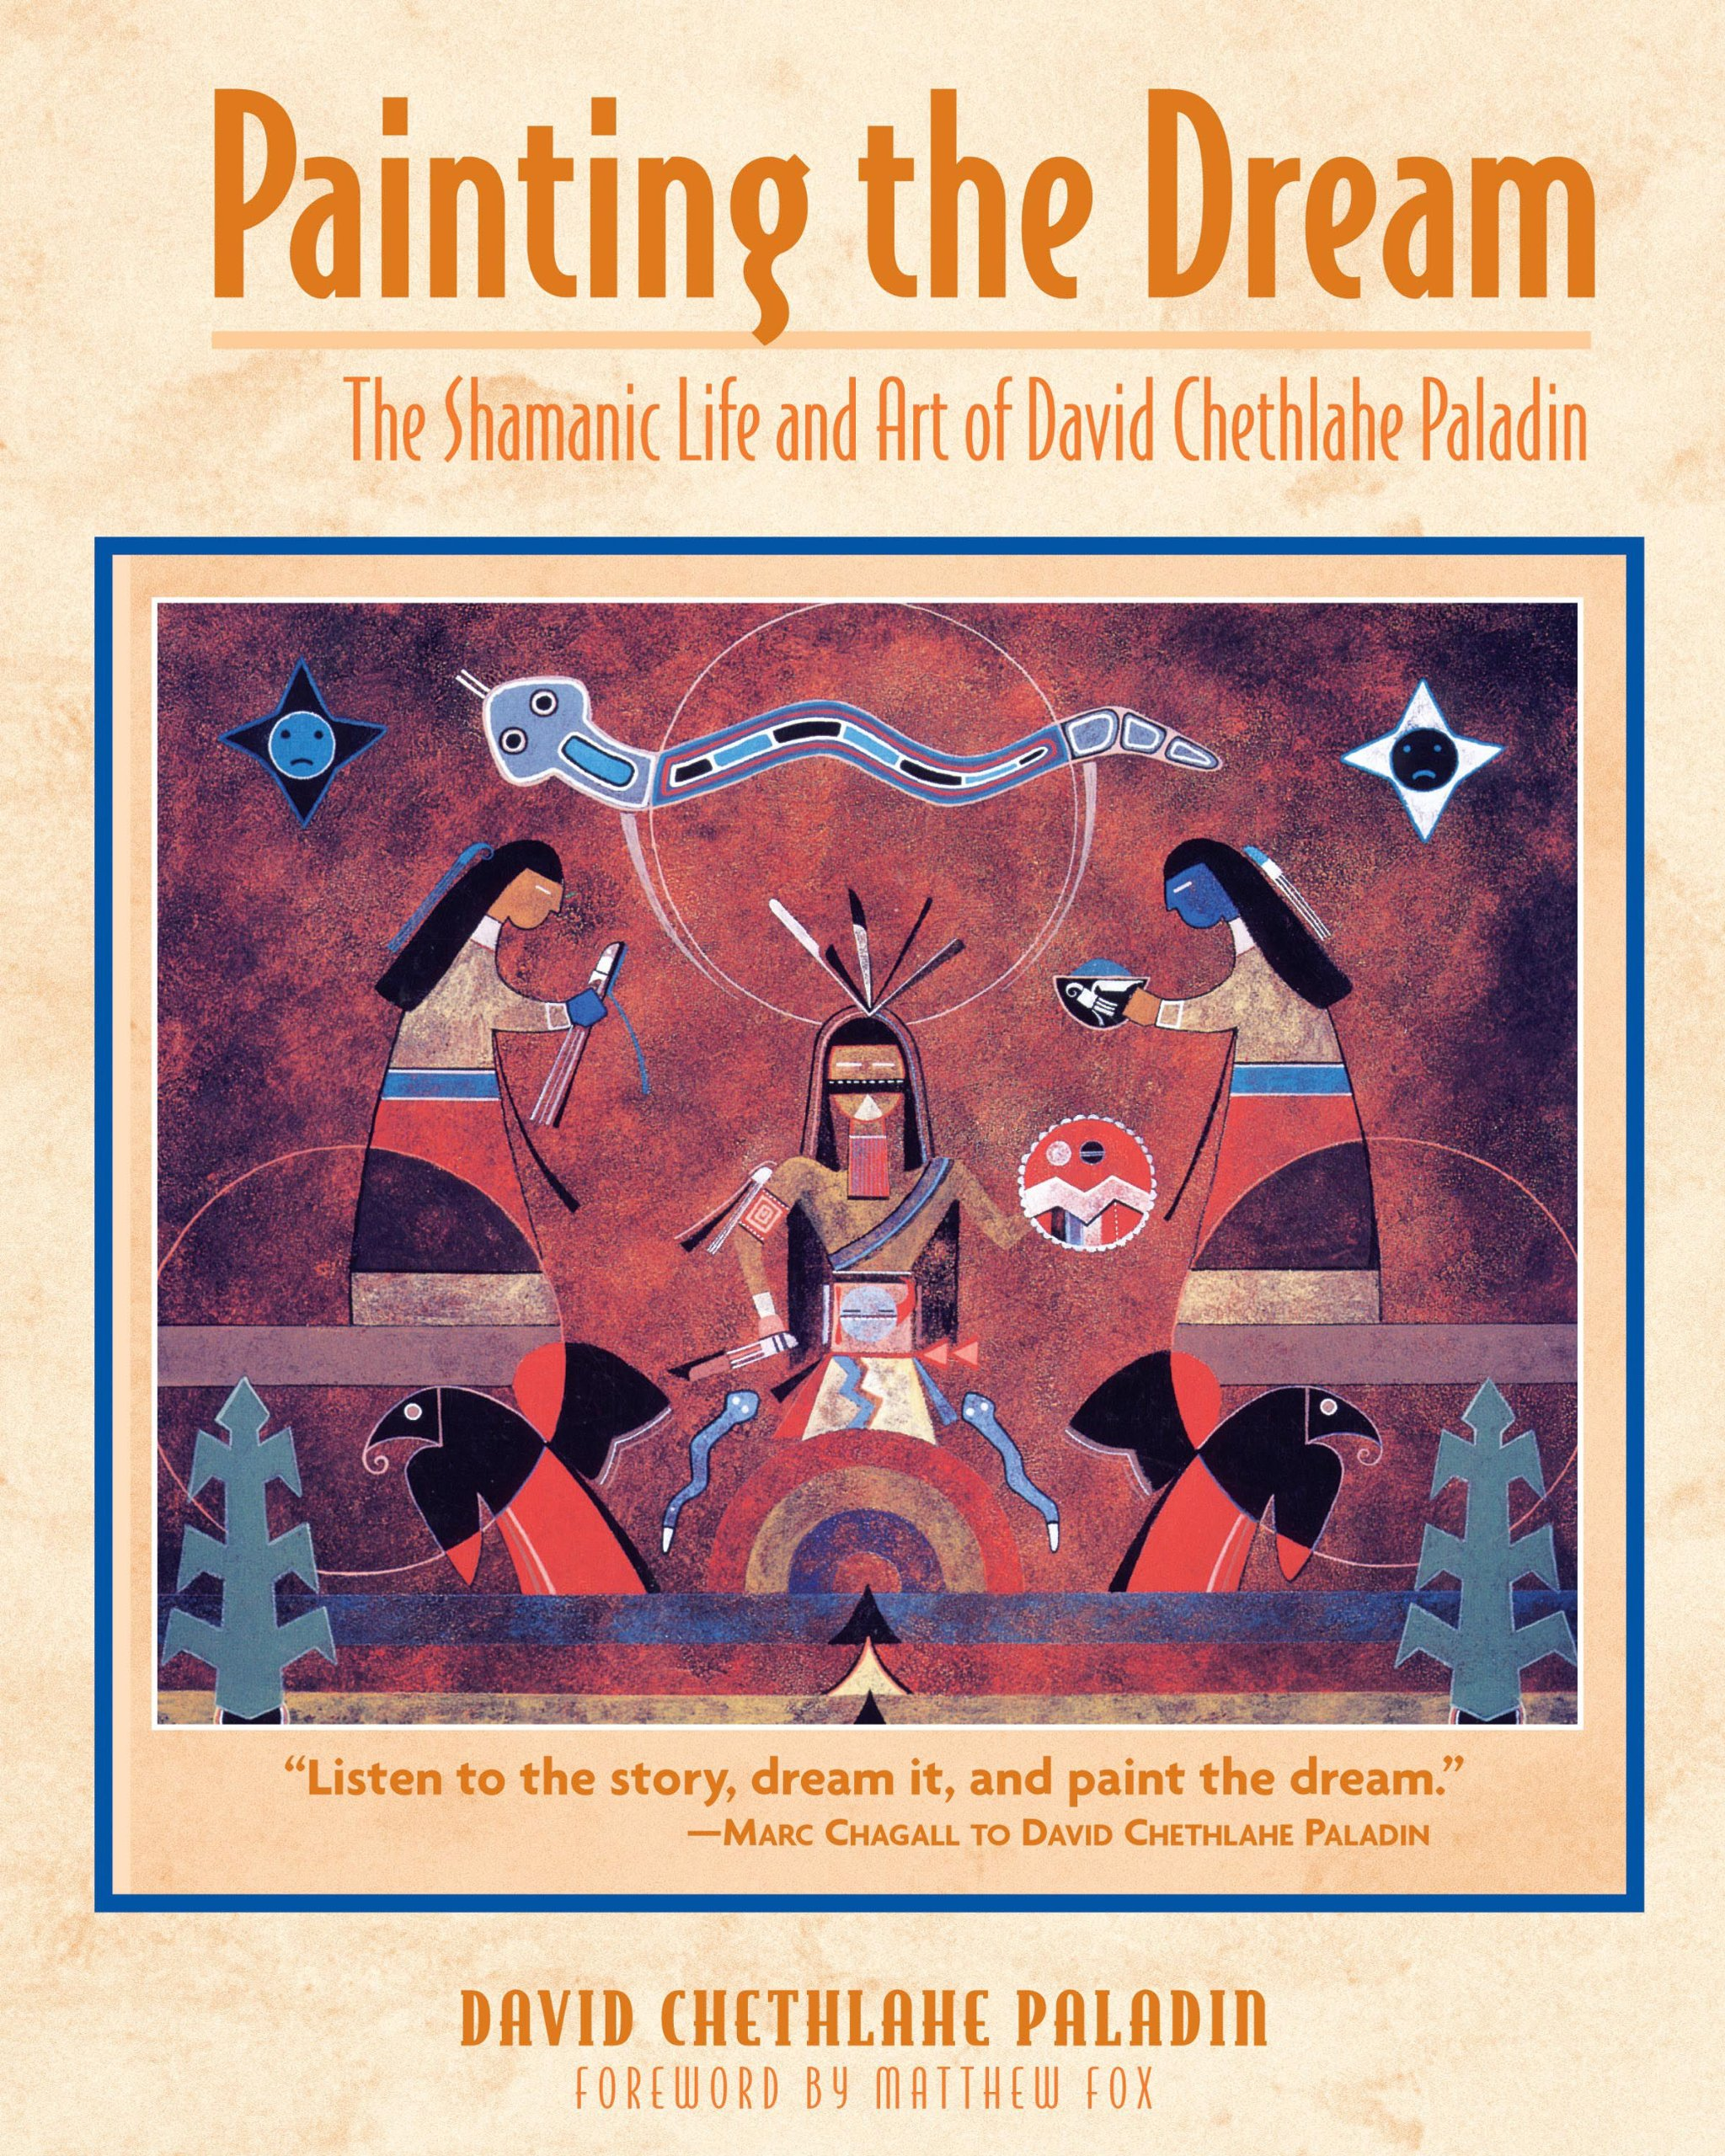 Painting the Dream: The Shamanic Life and Art of David Chethlahe Paladin